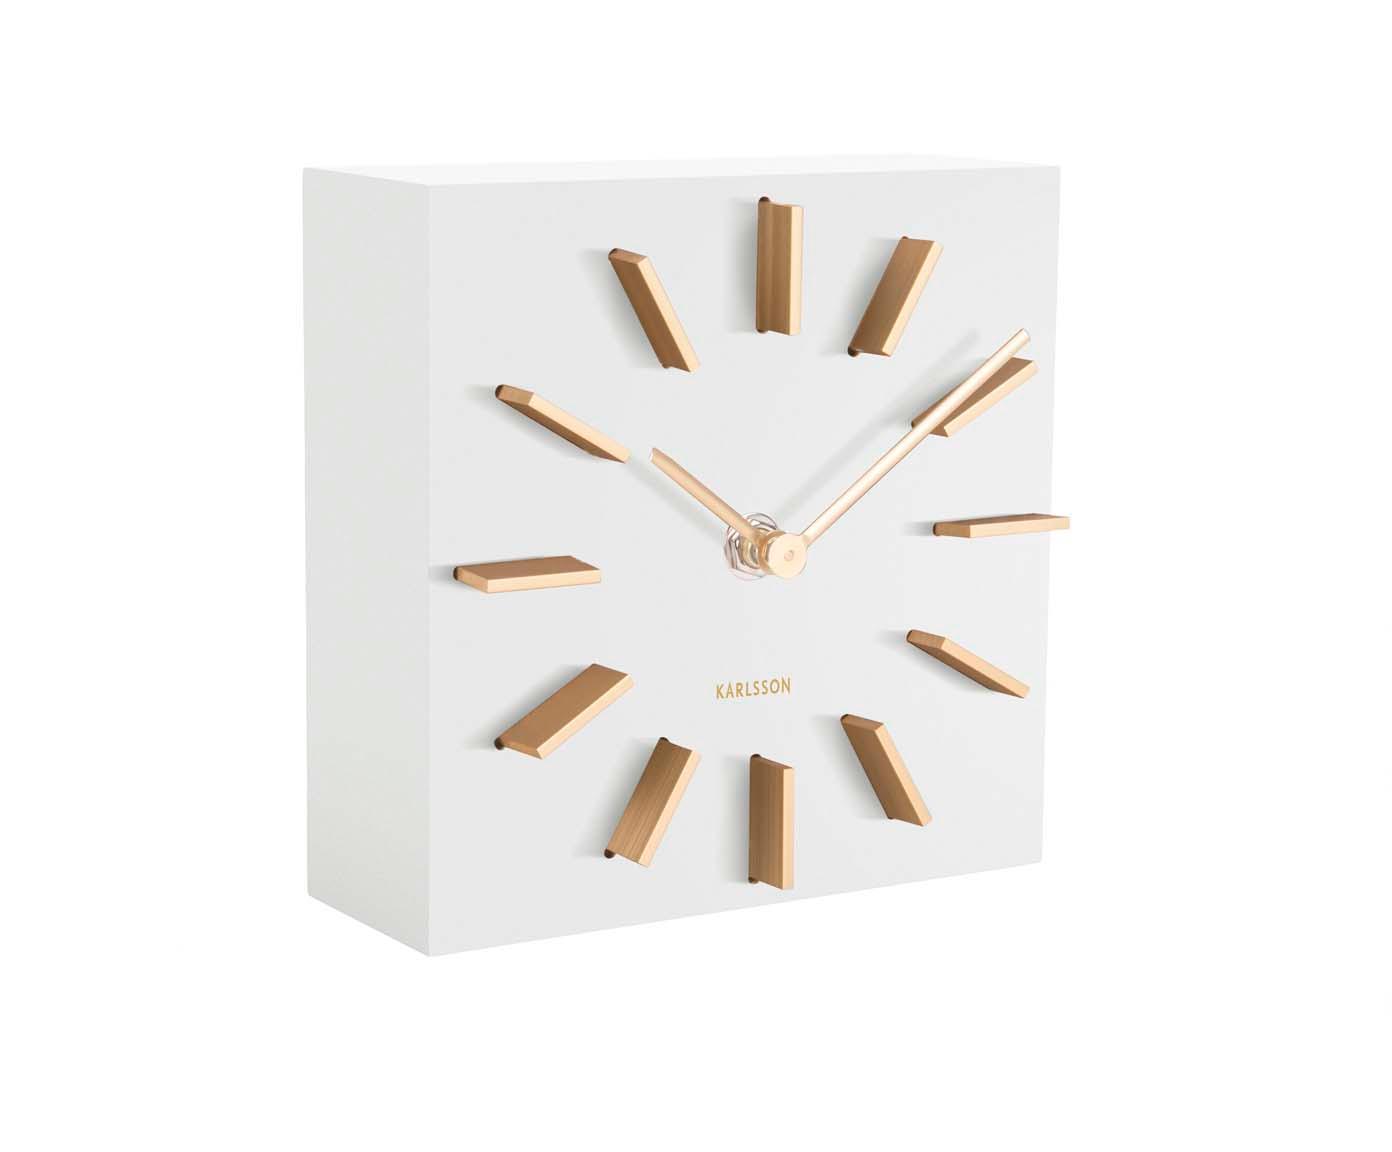 Tafelklok Discreet, MDF, Wit, goudkleurig, 15 x 15 cm